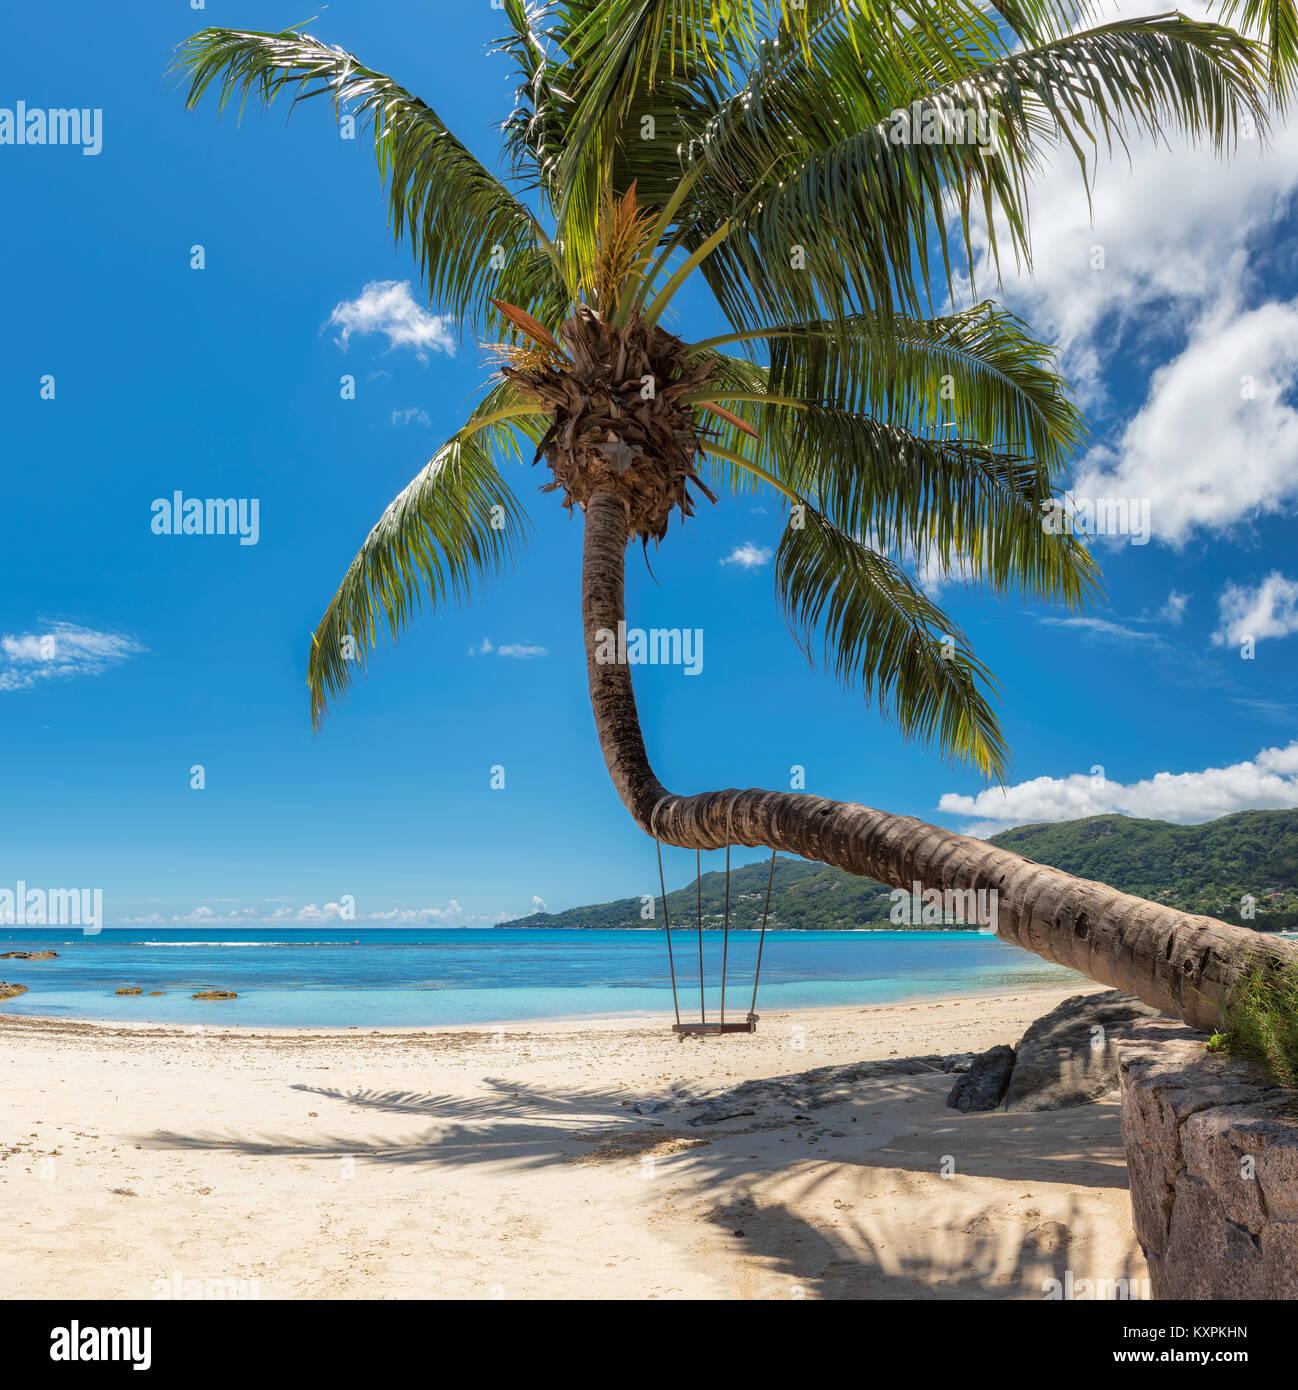 Palmera tropical beach en Seychelles, Mahe Island. Foto de stock